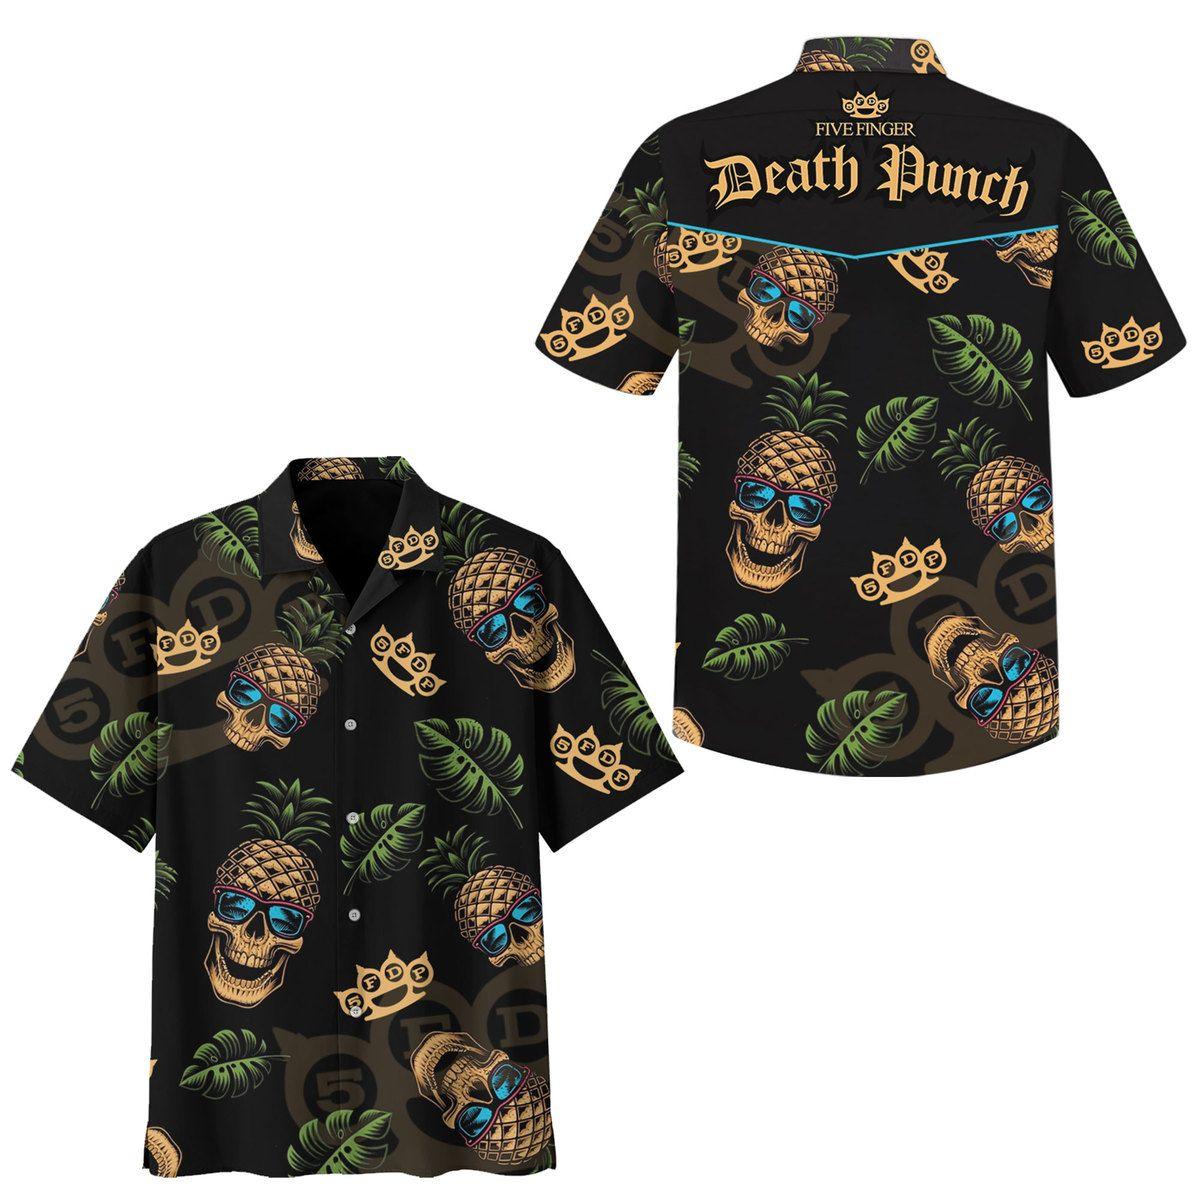 Death Punch Five Finger Skull pineapple HAWAIIAN SHIRT